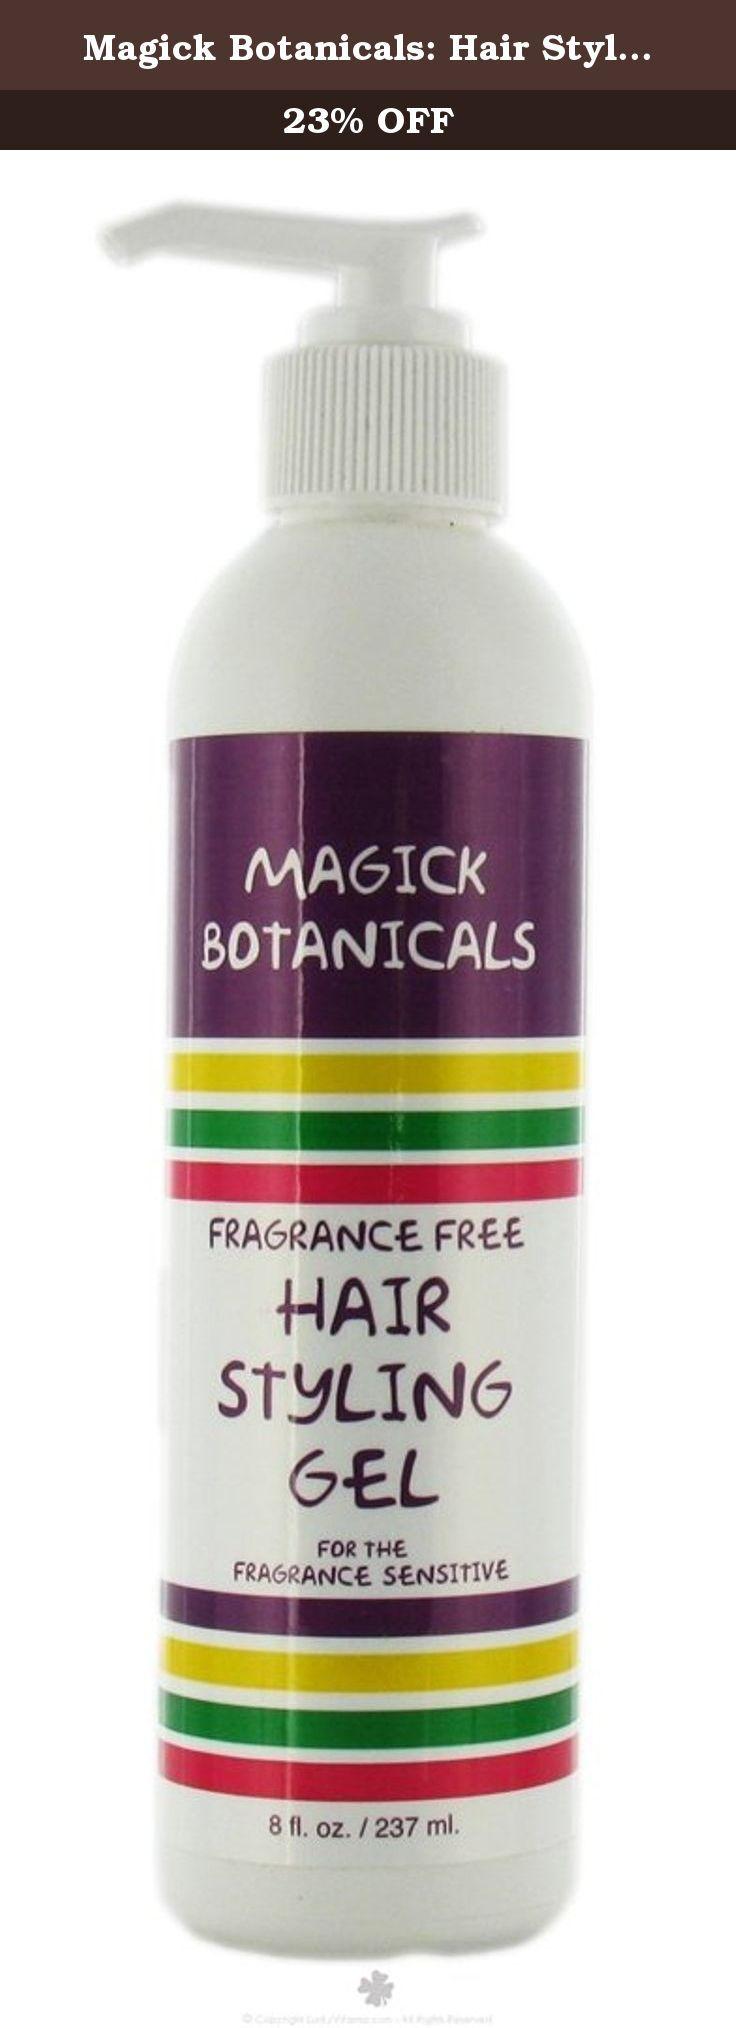 Magick Botanicals Hair Styling Gel 8 Oz Hair Styling Gel Unscented By Magick Botanicals 8 Oz Gel Fragrance Free Hair Gel Fragrance Free Products Styling Gel